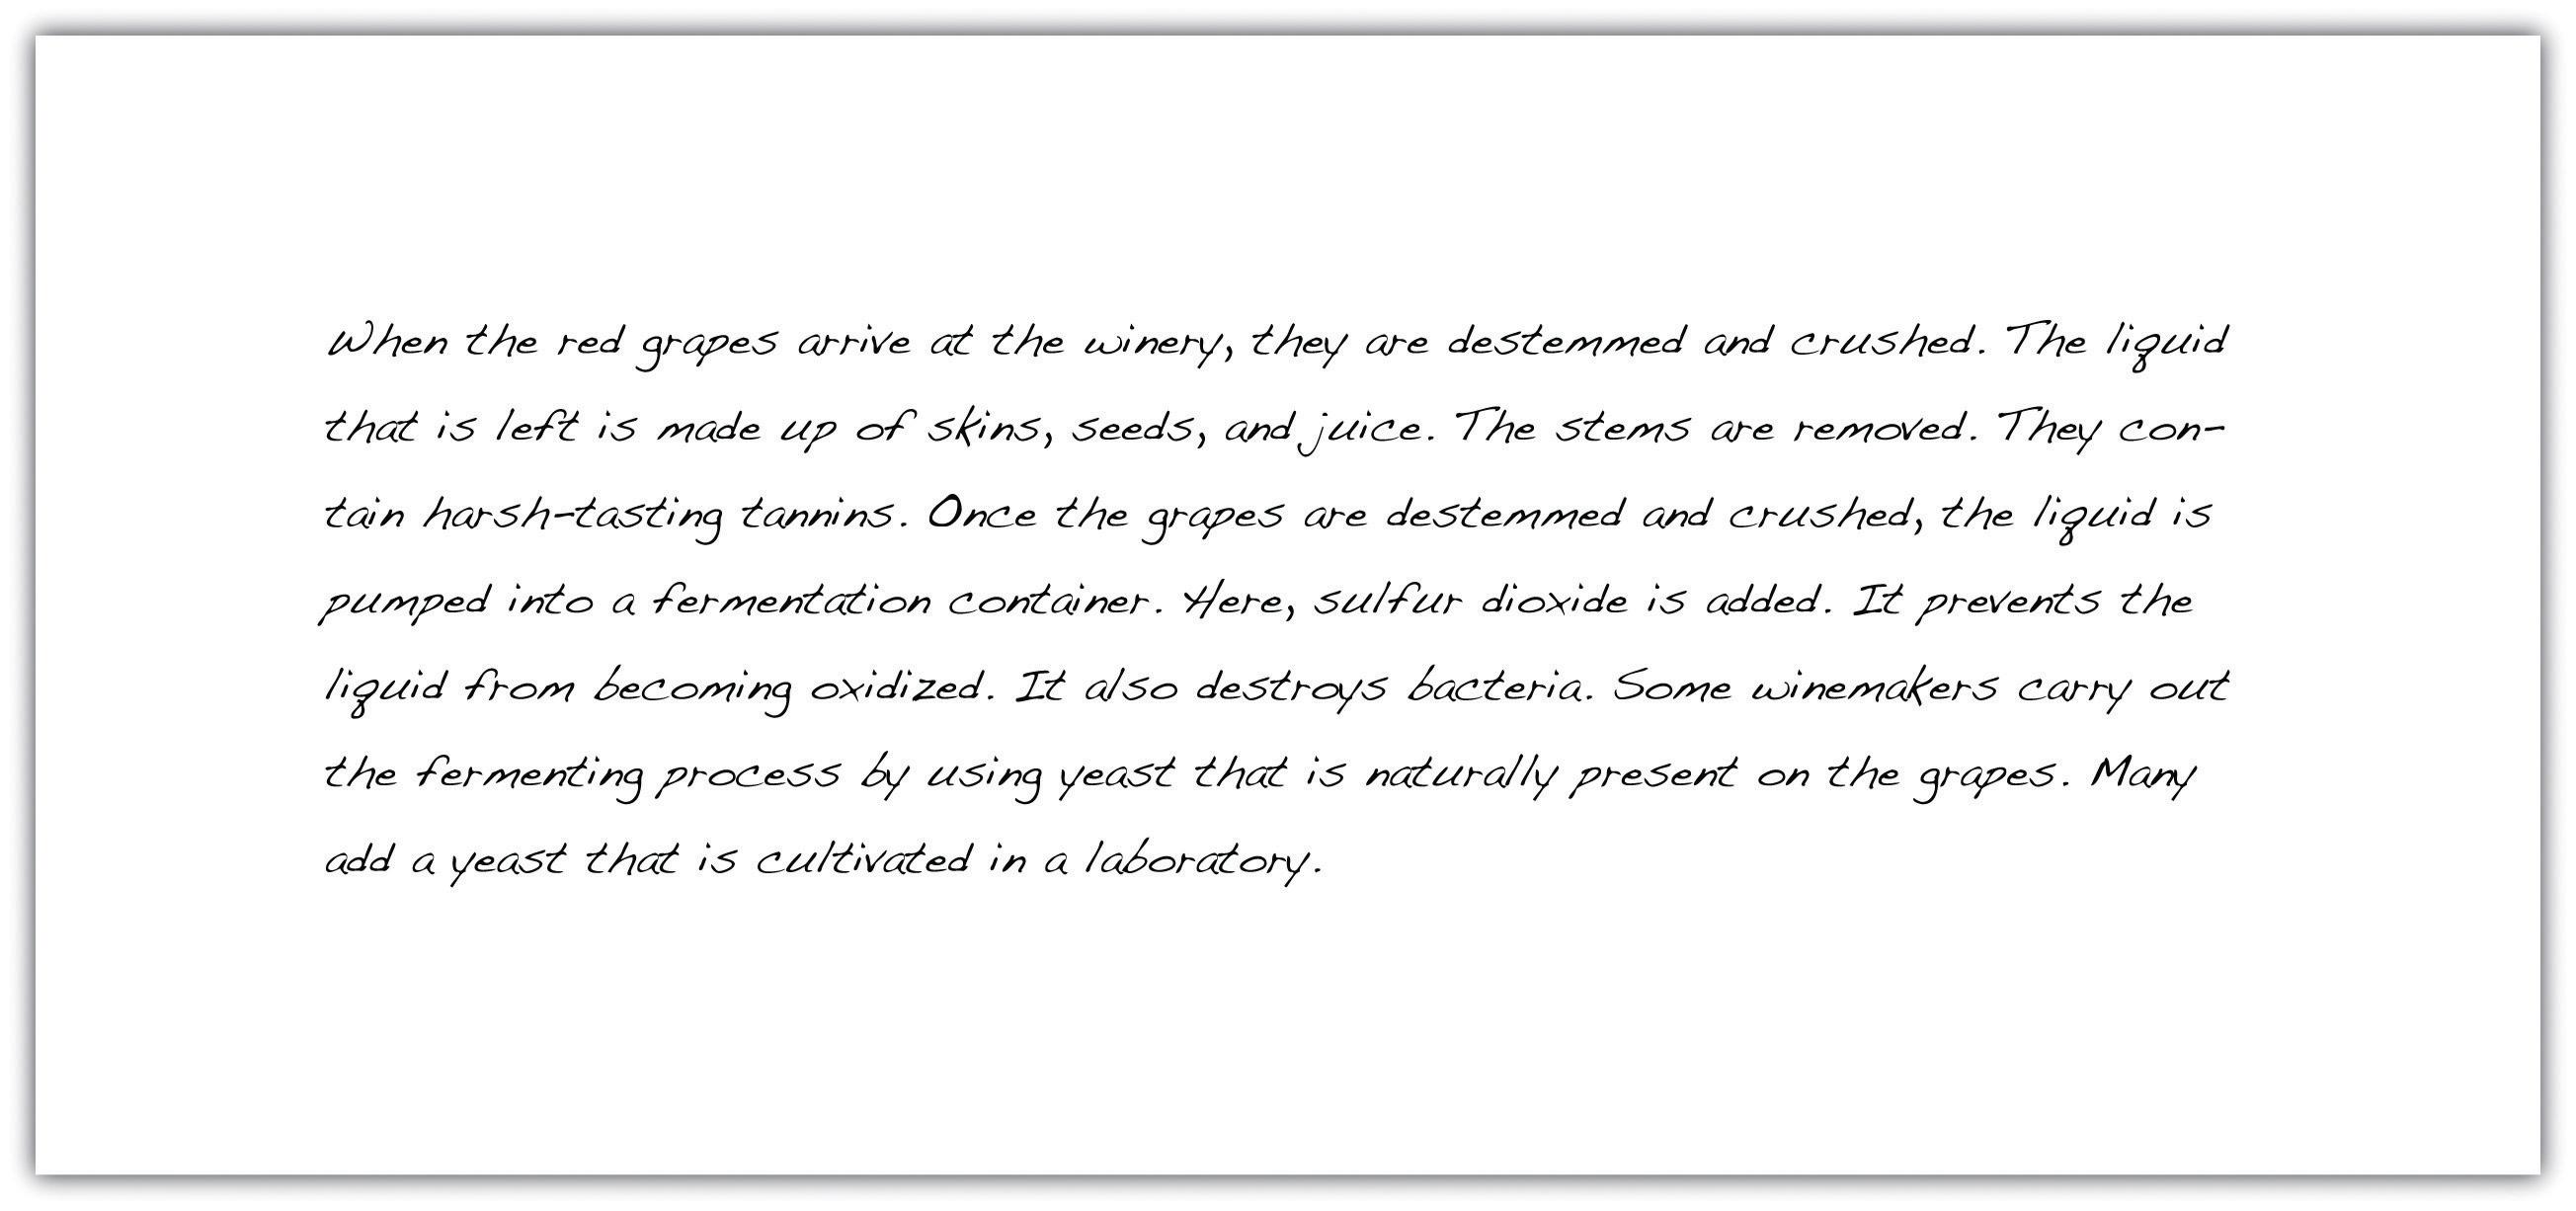 011 Essay Example Healthy Impressive Eating Topics Spm Habits Pdf Full